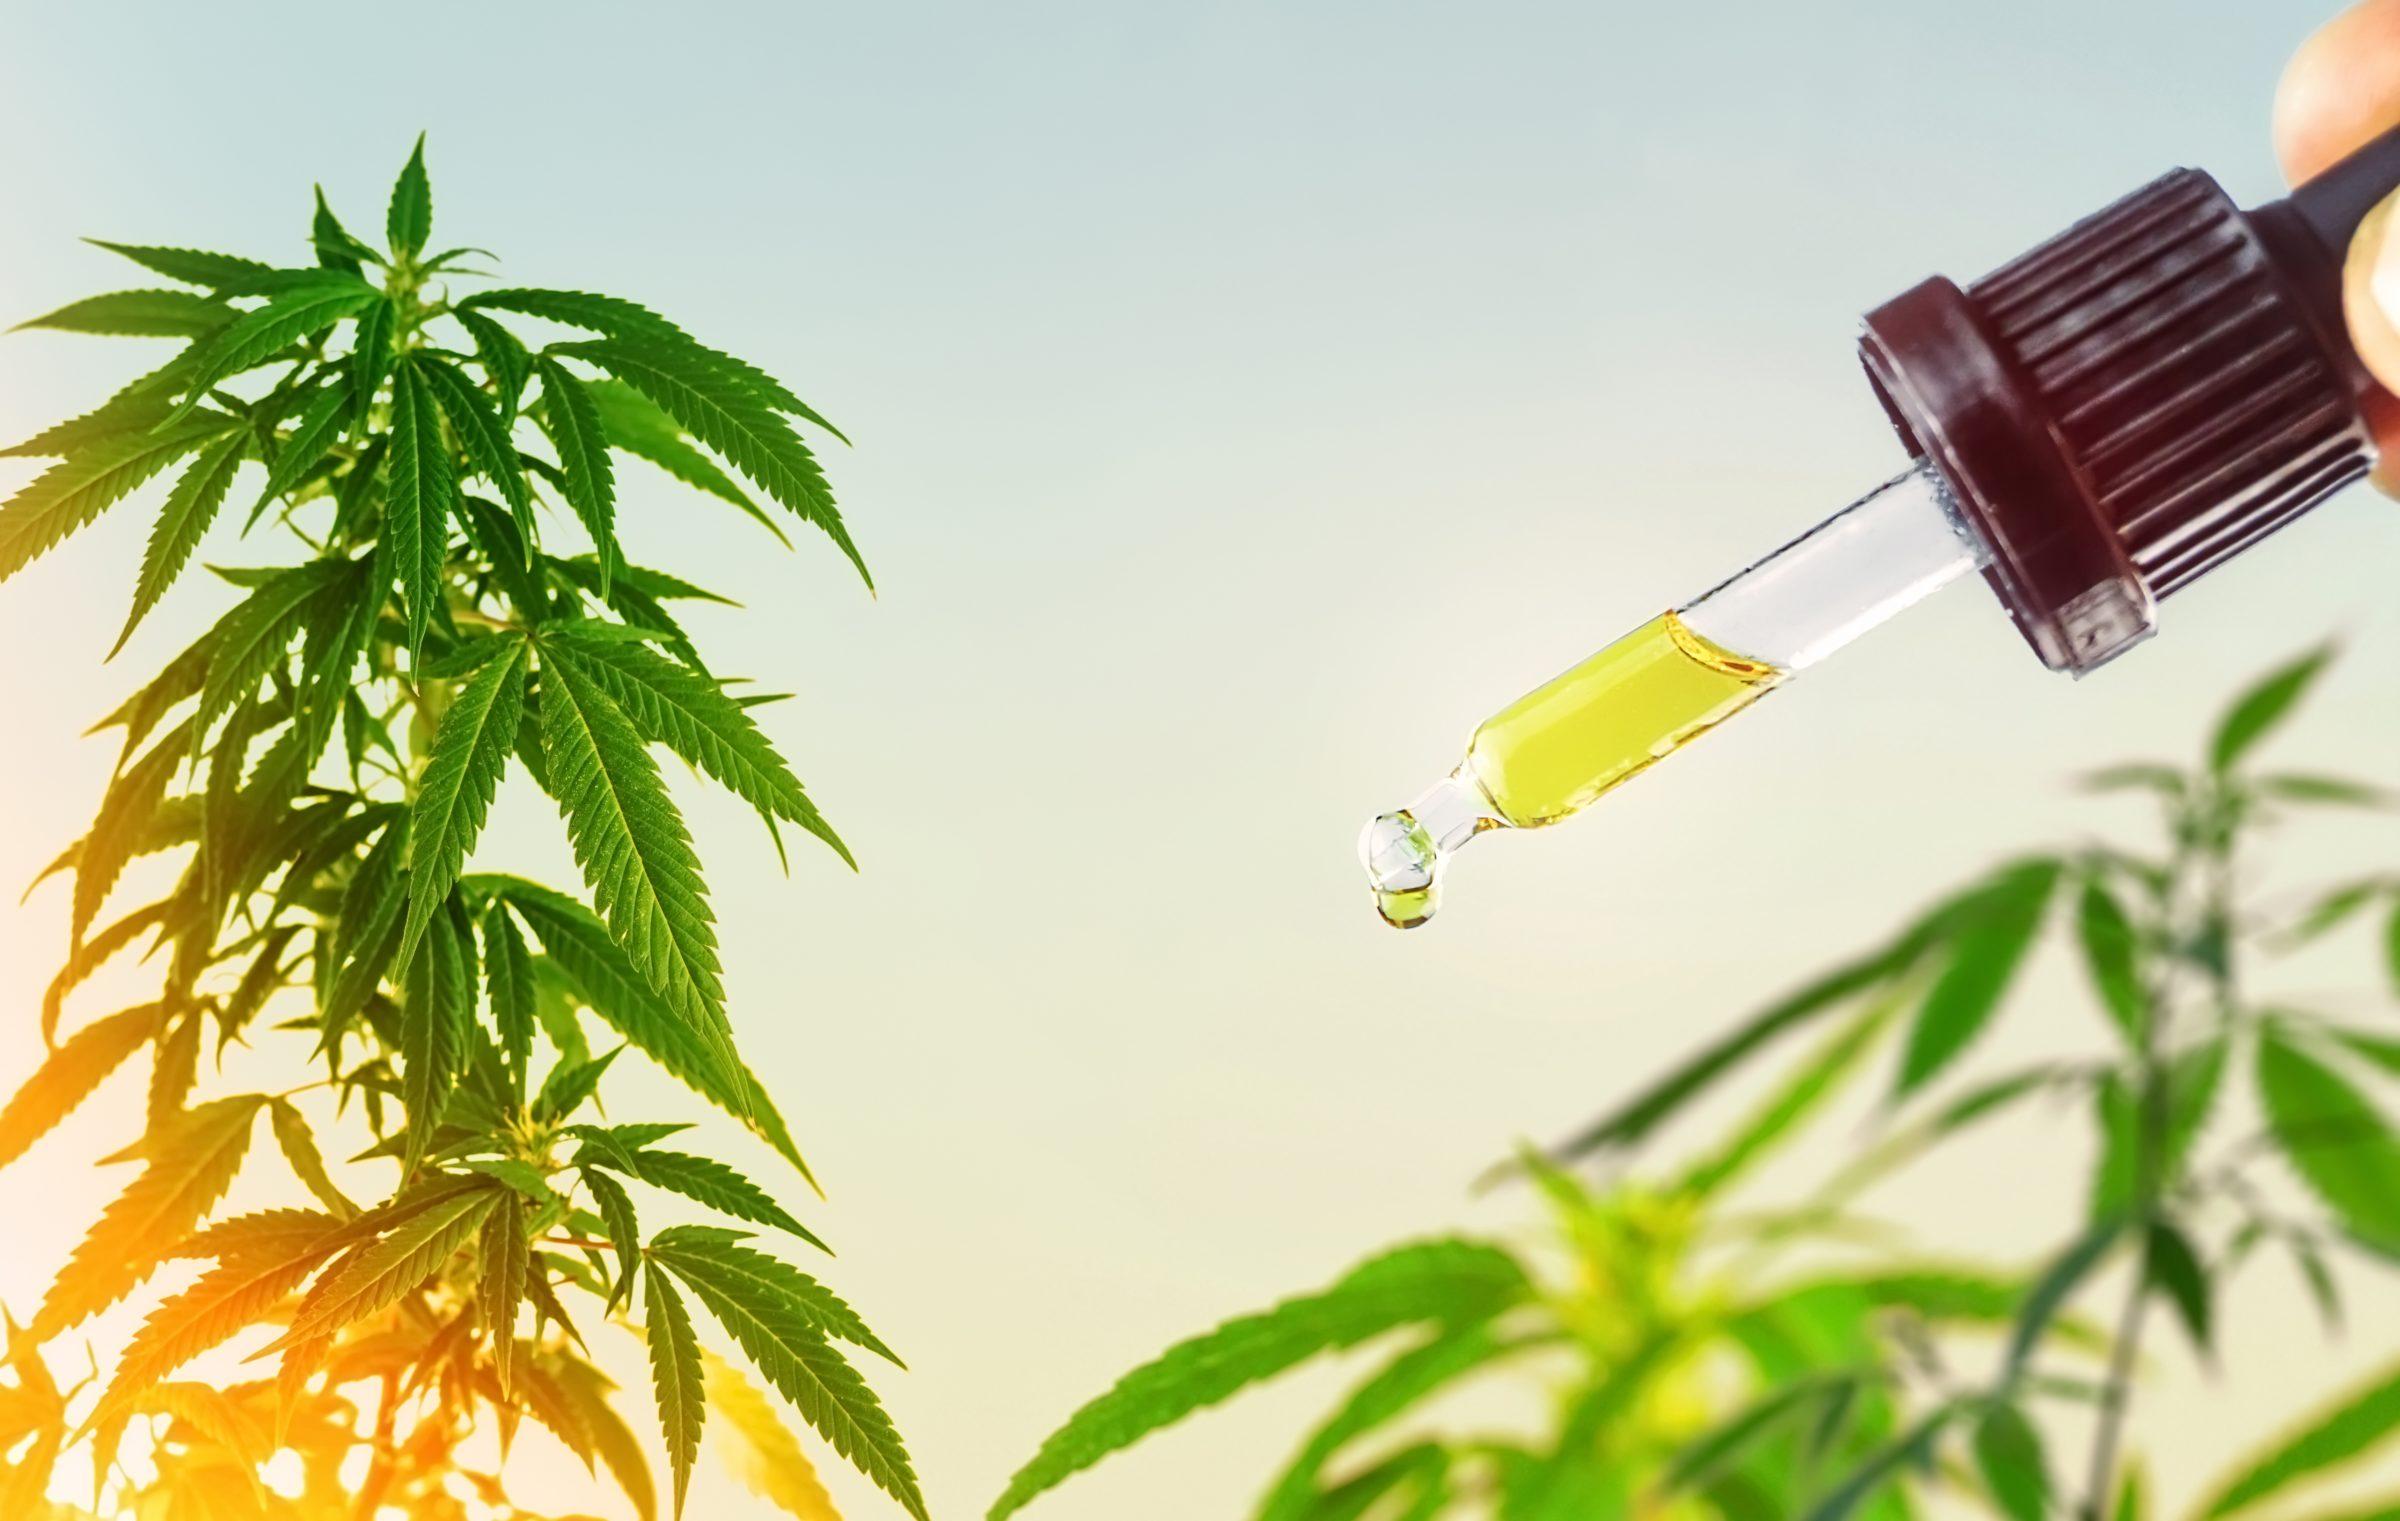 cbd oil against marijuana plants XFWFUCX